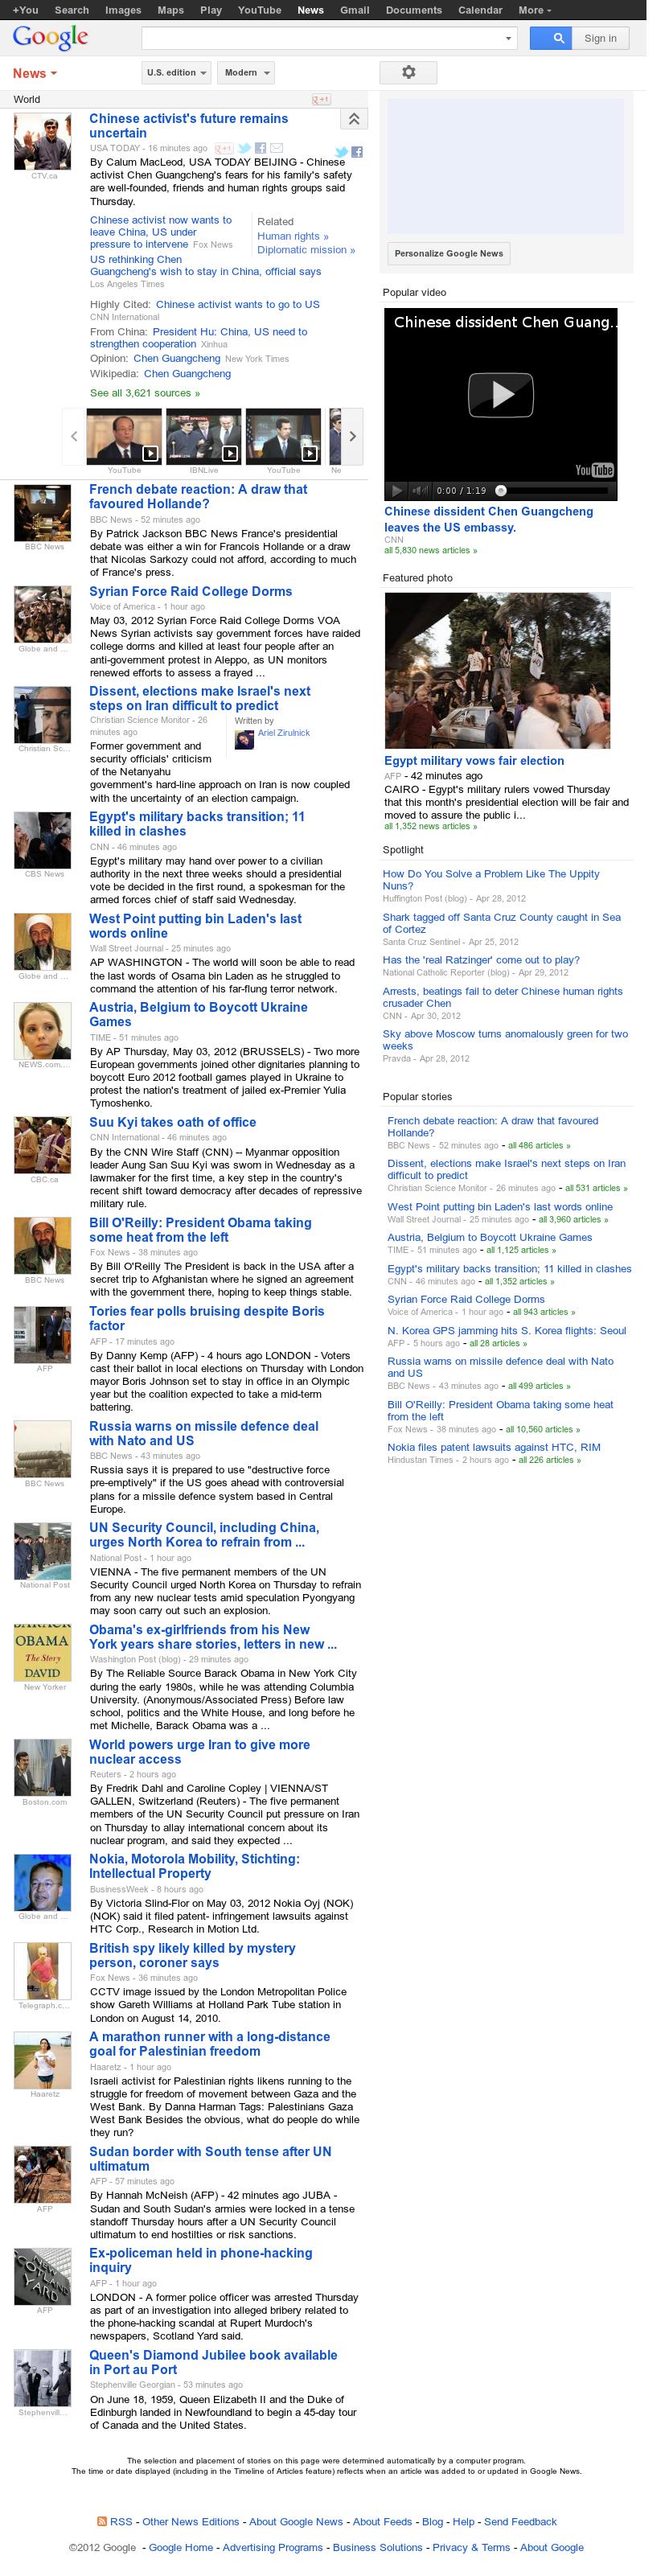 Google News: World at Thursday May 3, 2012, 1:07 p.m. UTC